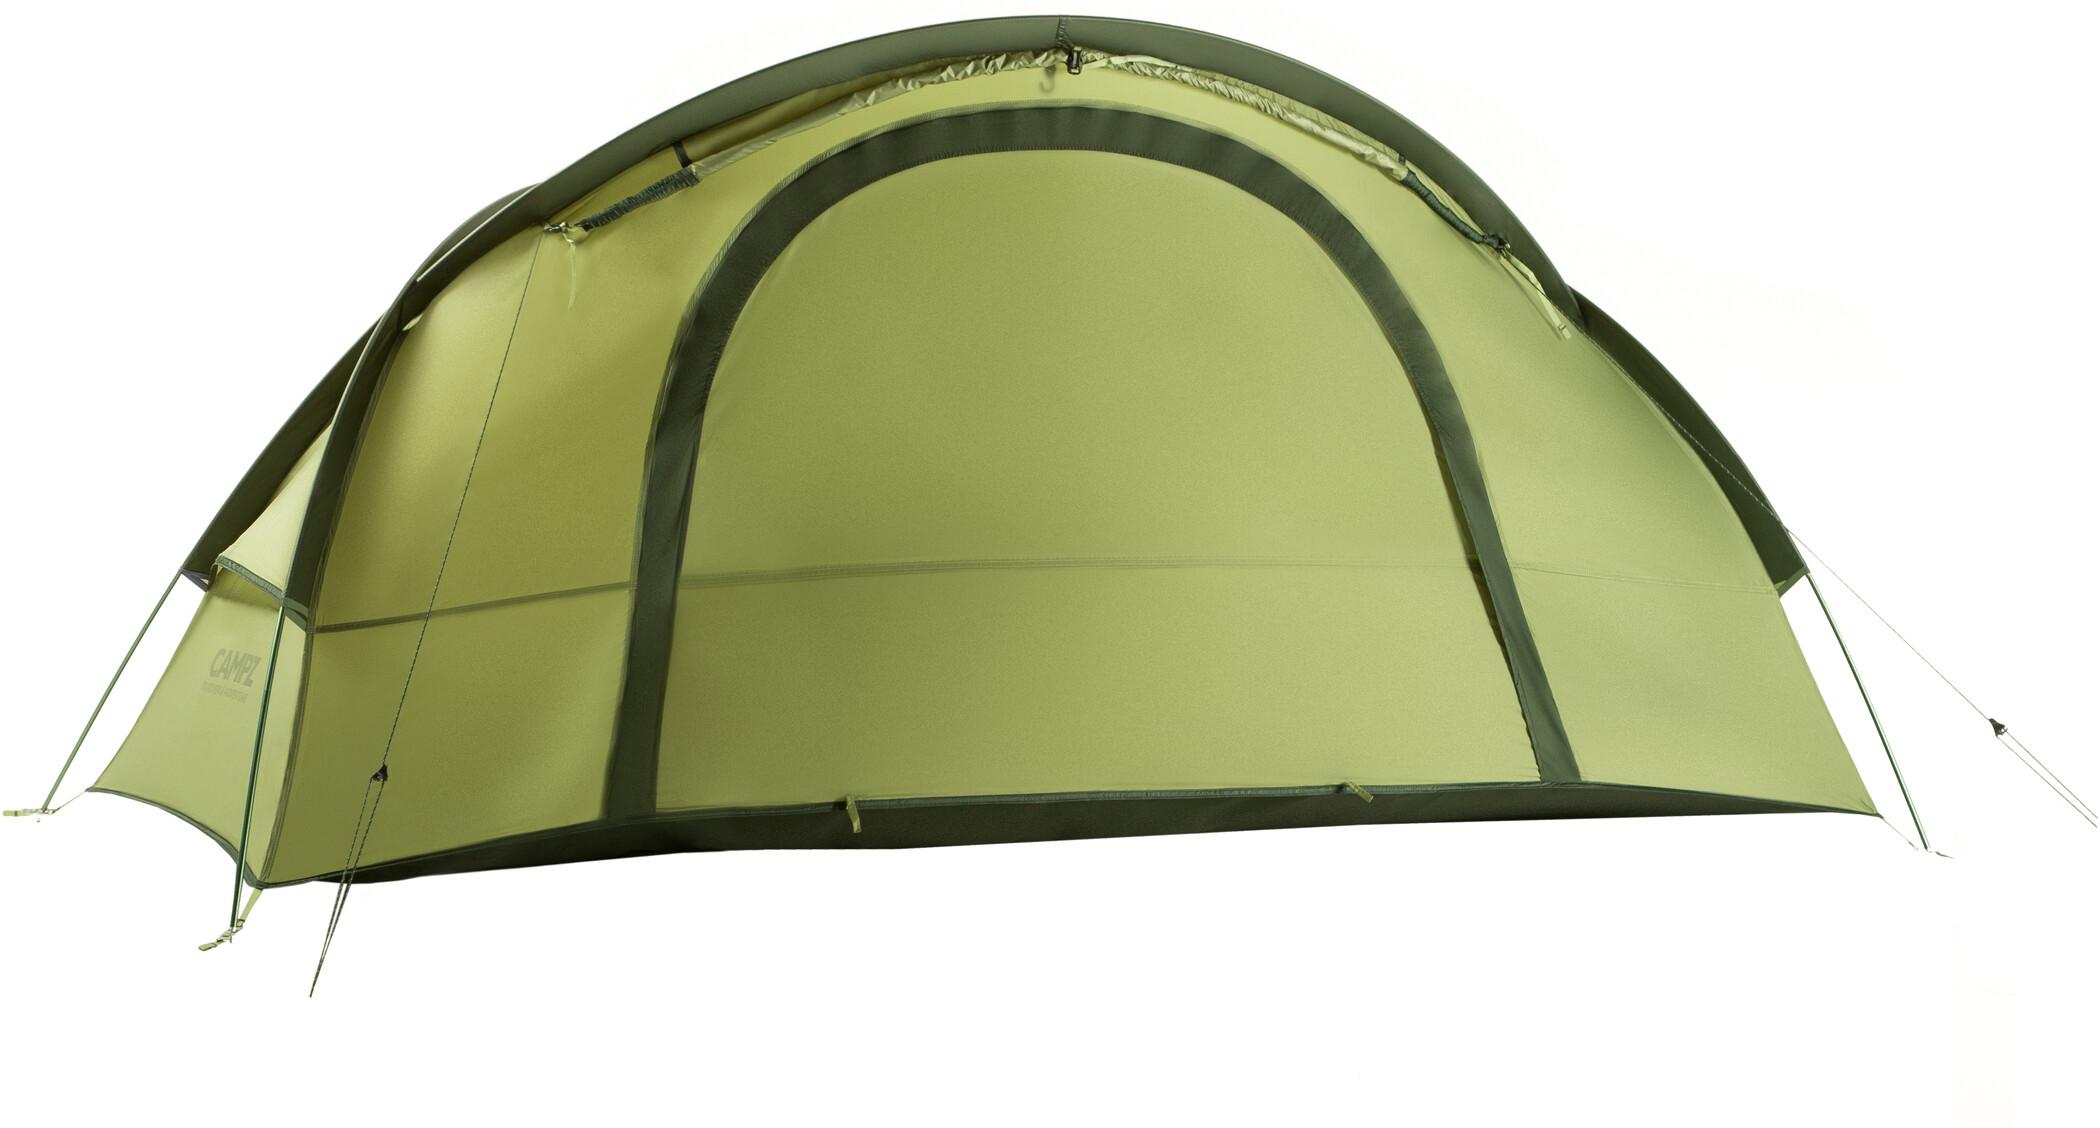 CAMPZ Millau Ultralight Zelt 1P sageolive